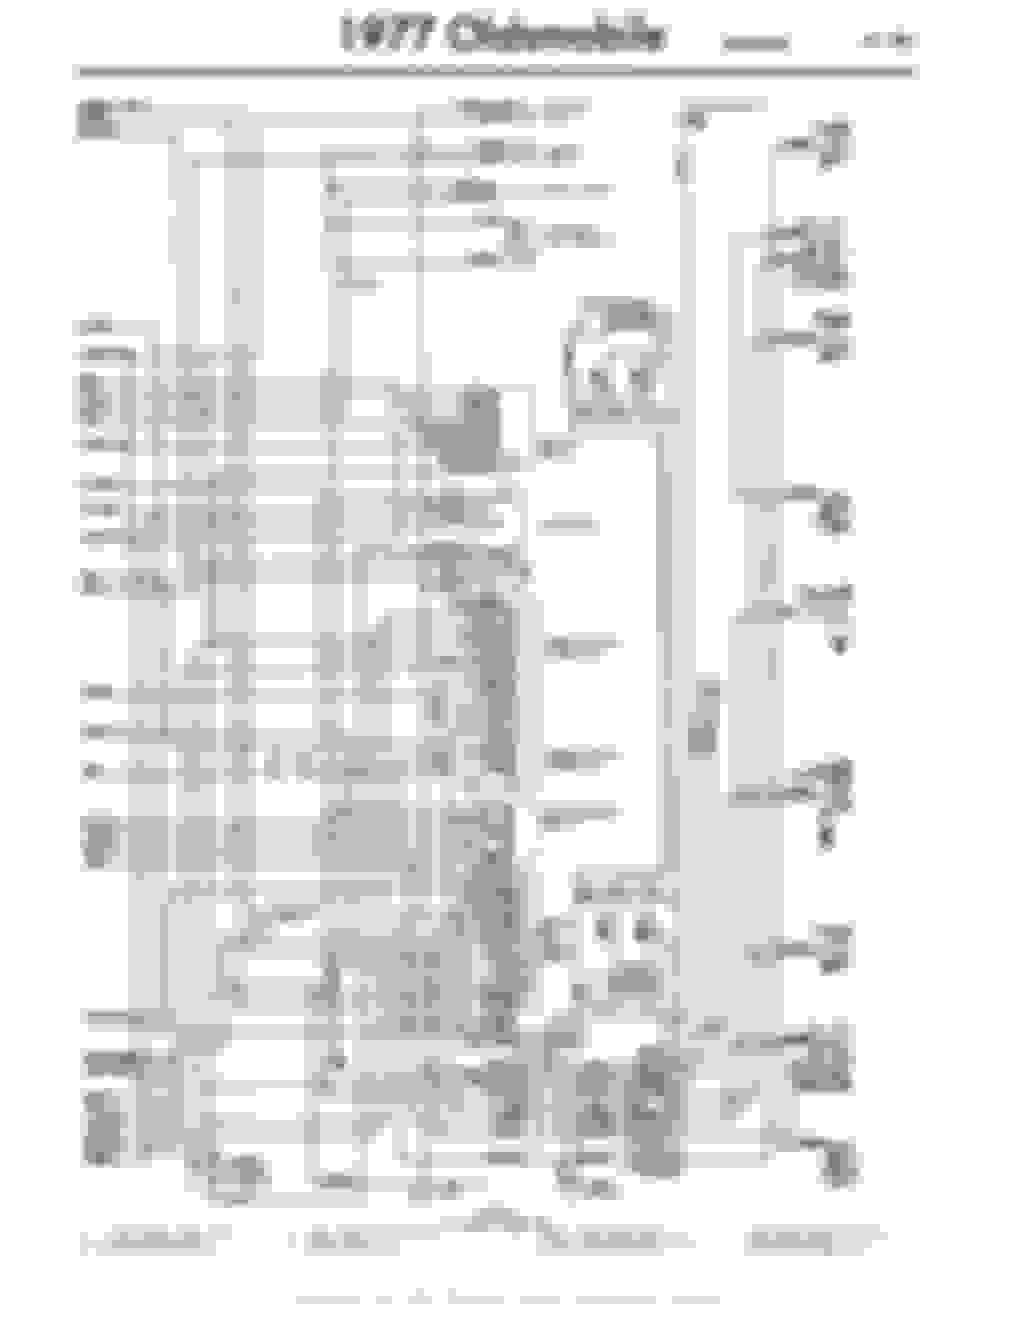 hight resolution of 77 toronado wiring diagram classicoldsmobile com1977 toronado chassis wiring page 2